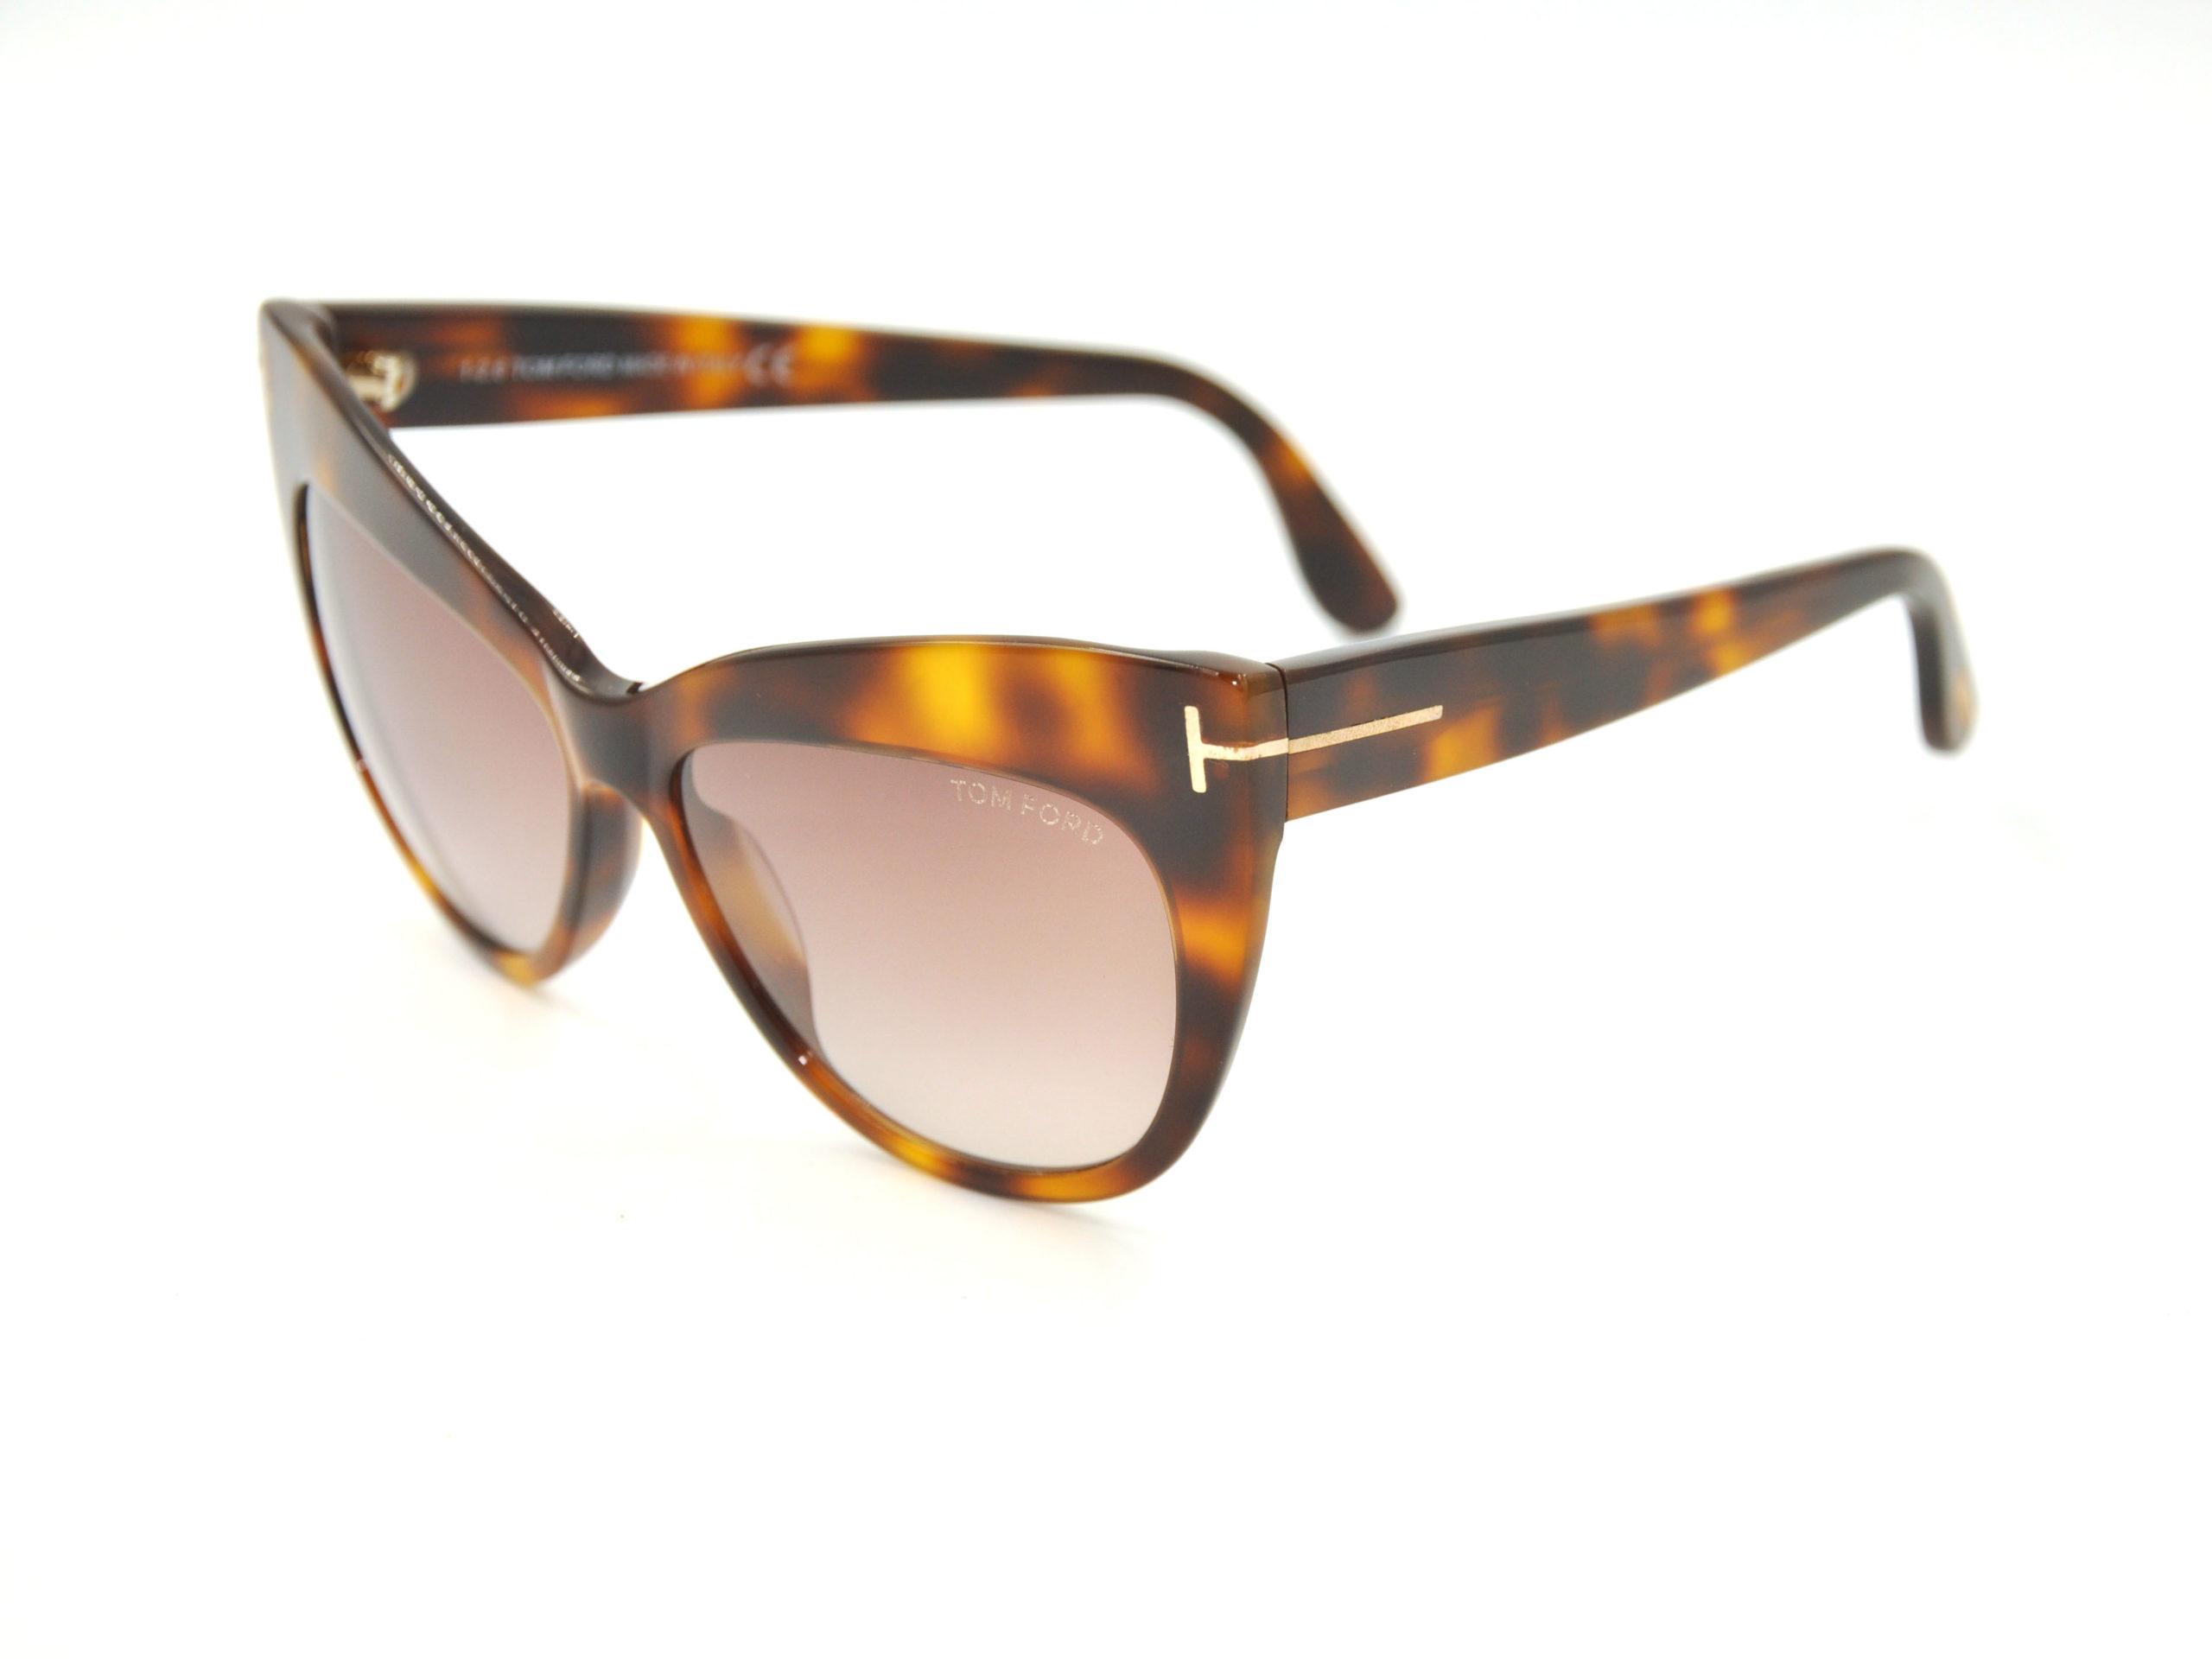 TOM FORD NIKA TF523 53F Sunglasses 2018